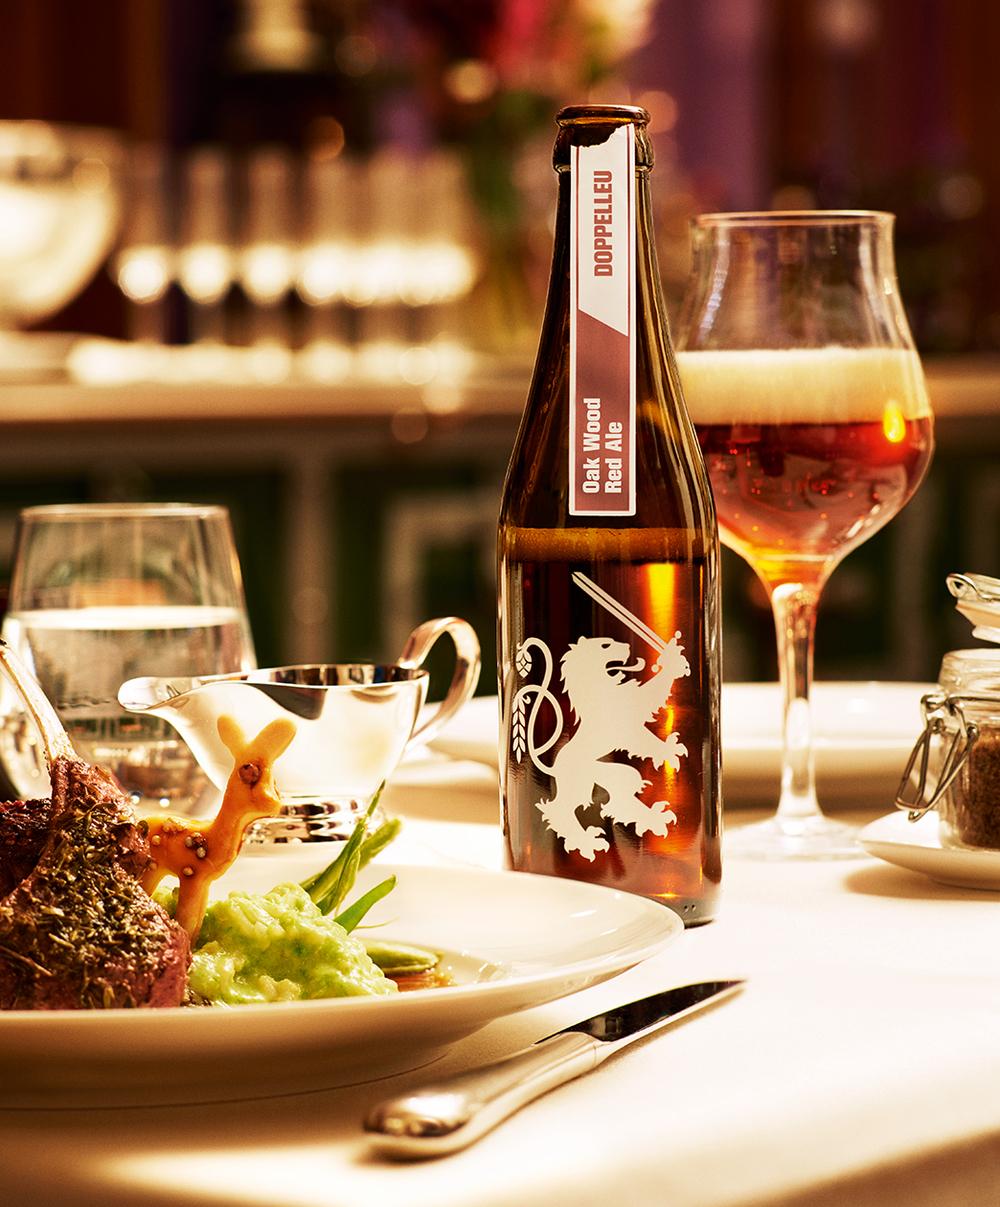 Doppelleu_Sixpack_Oak Wood Red Ale.jpg